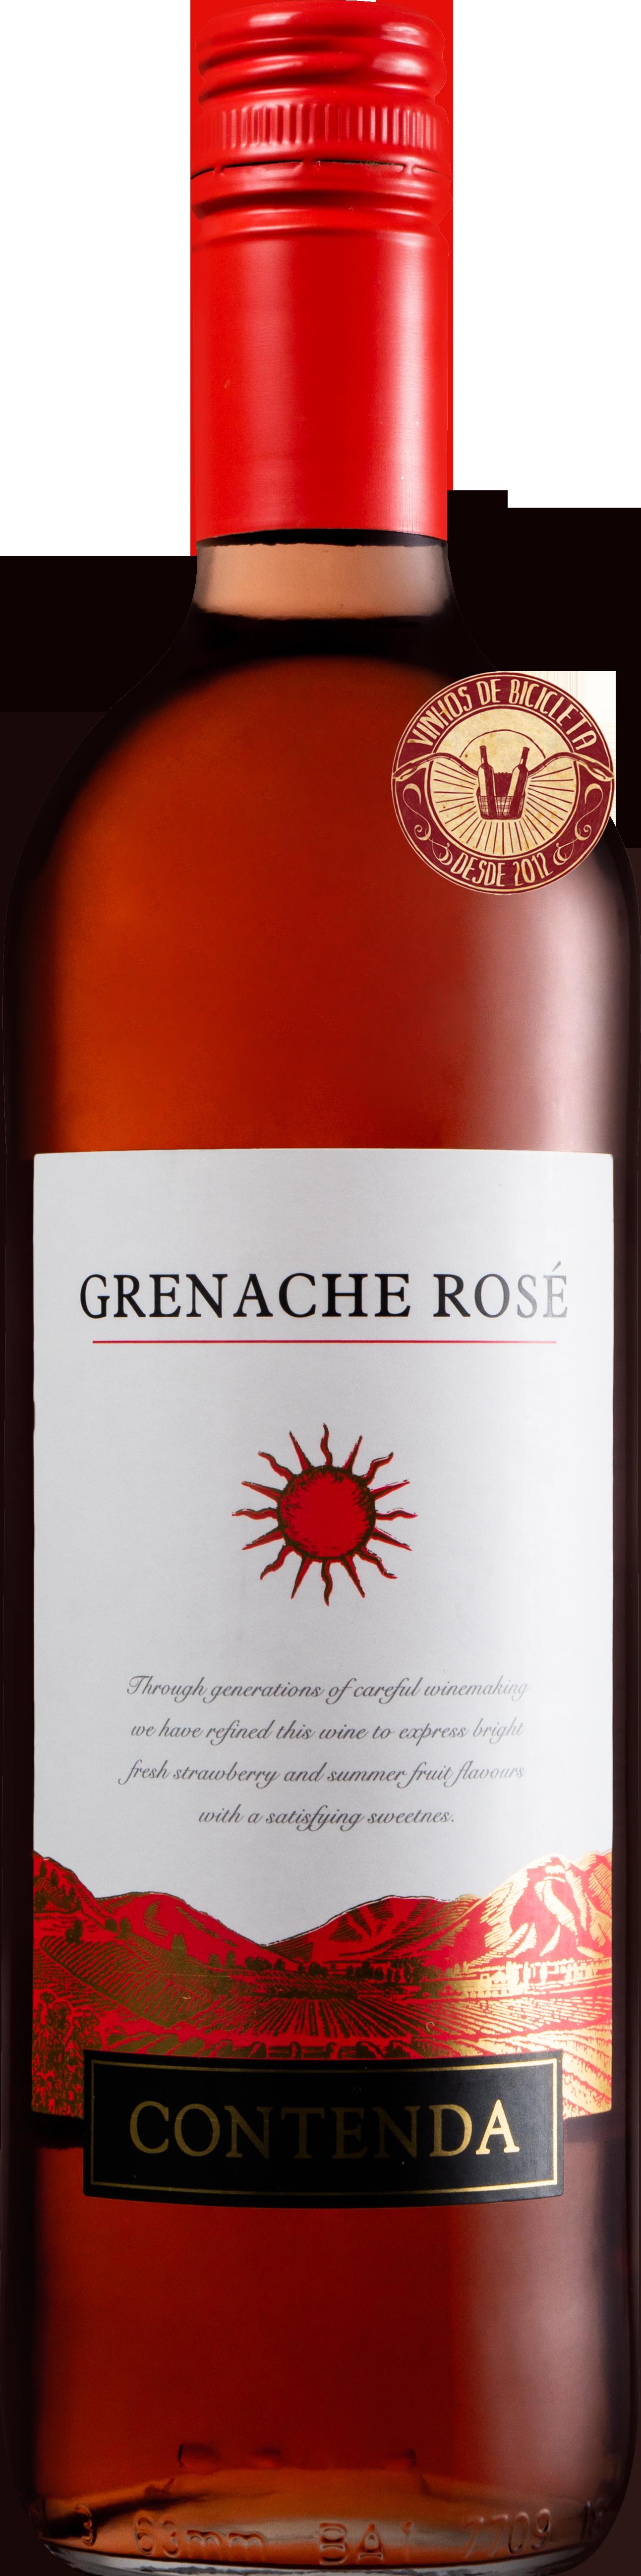 Contenda Grenache Rosé